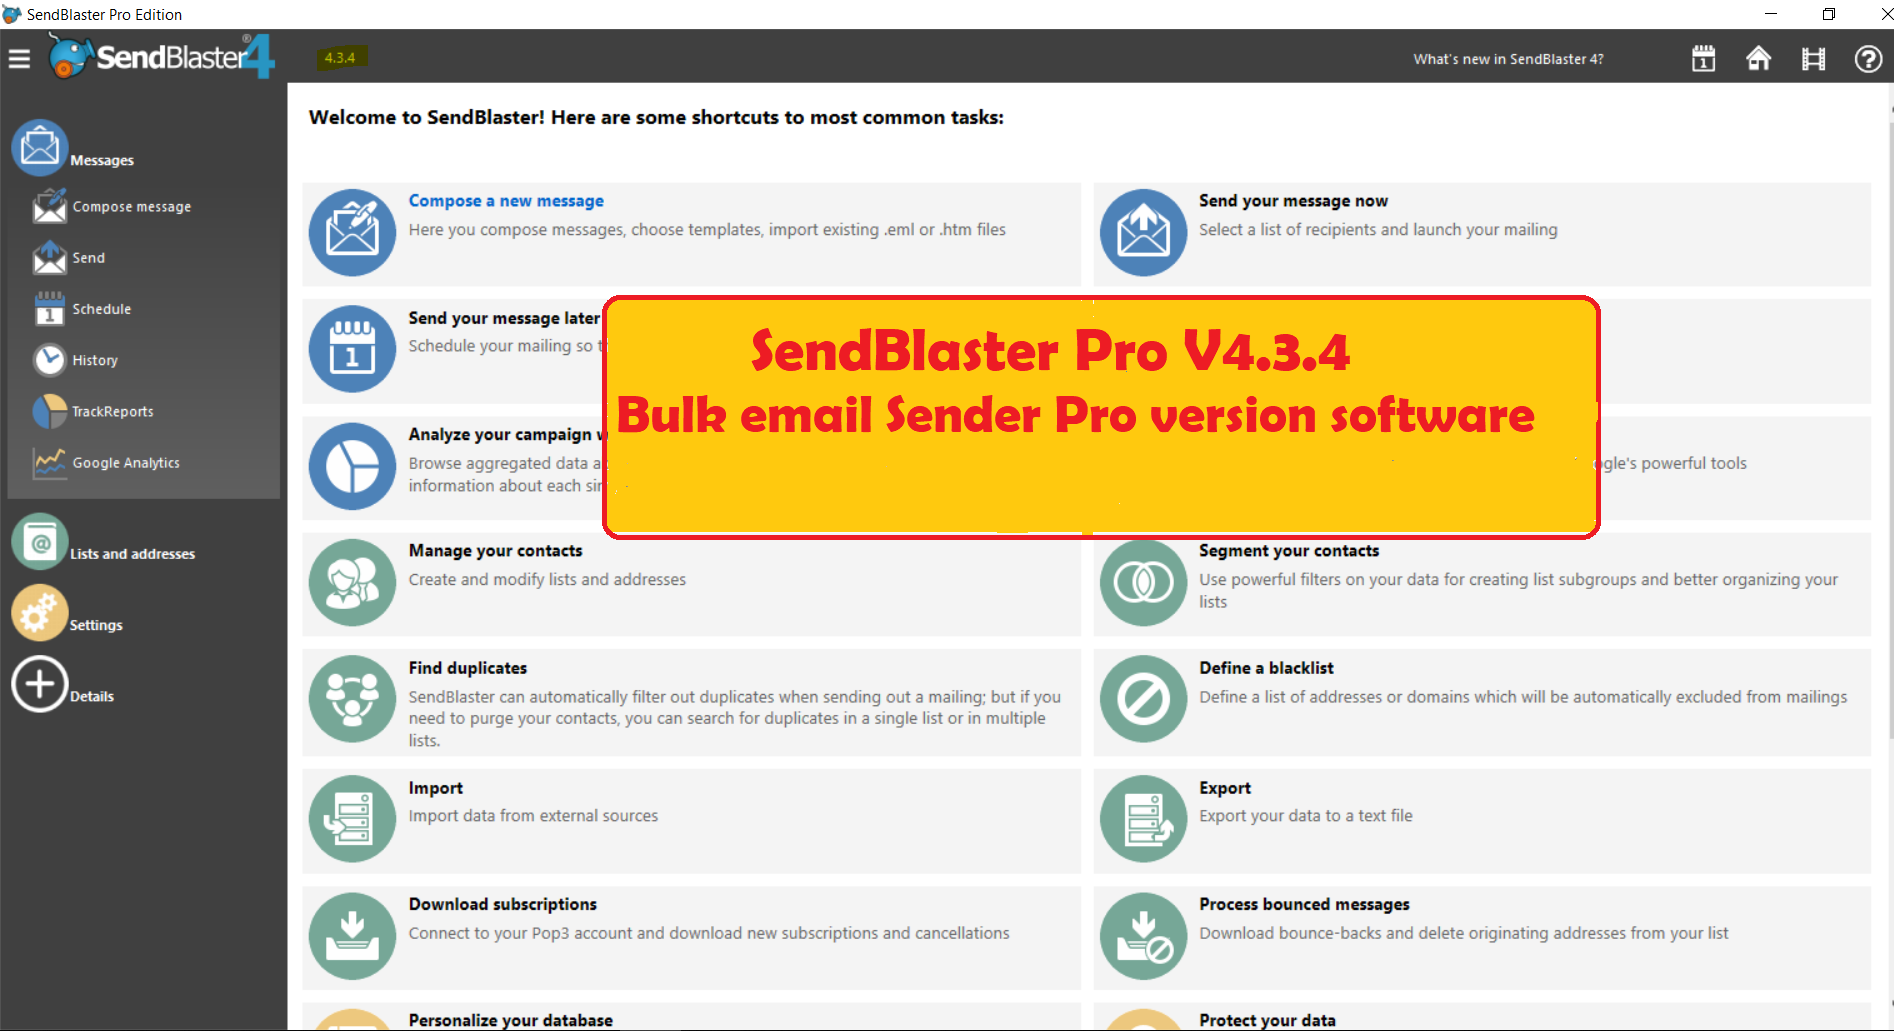 SendBlaster Pro V4.3.4 - Bulk email Sender software Pro version | Best  Marketing Tools!